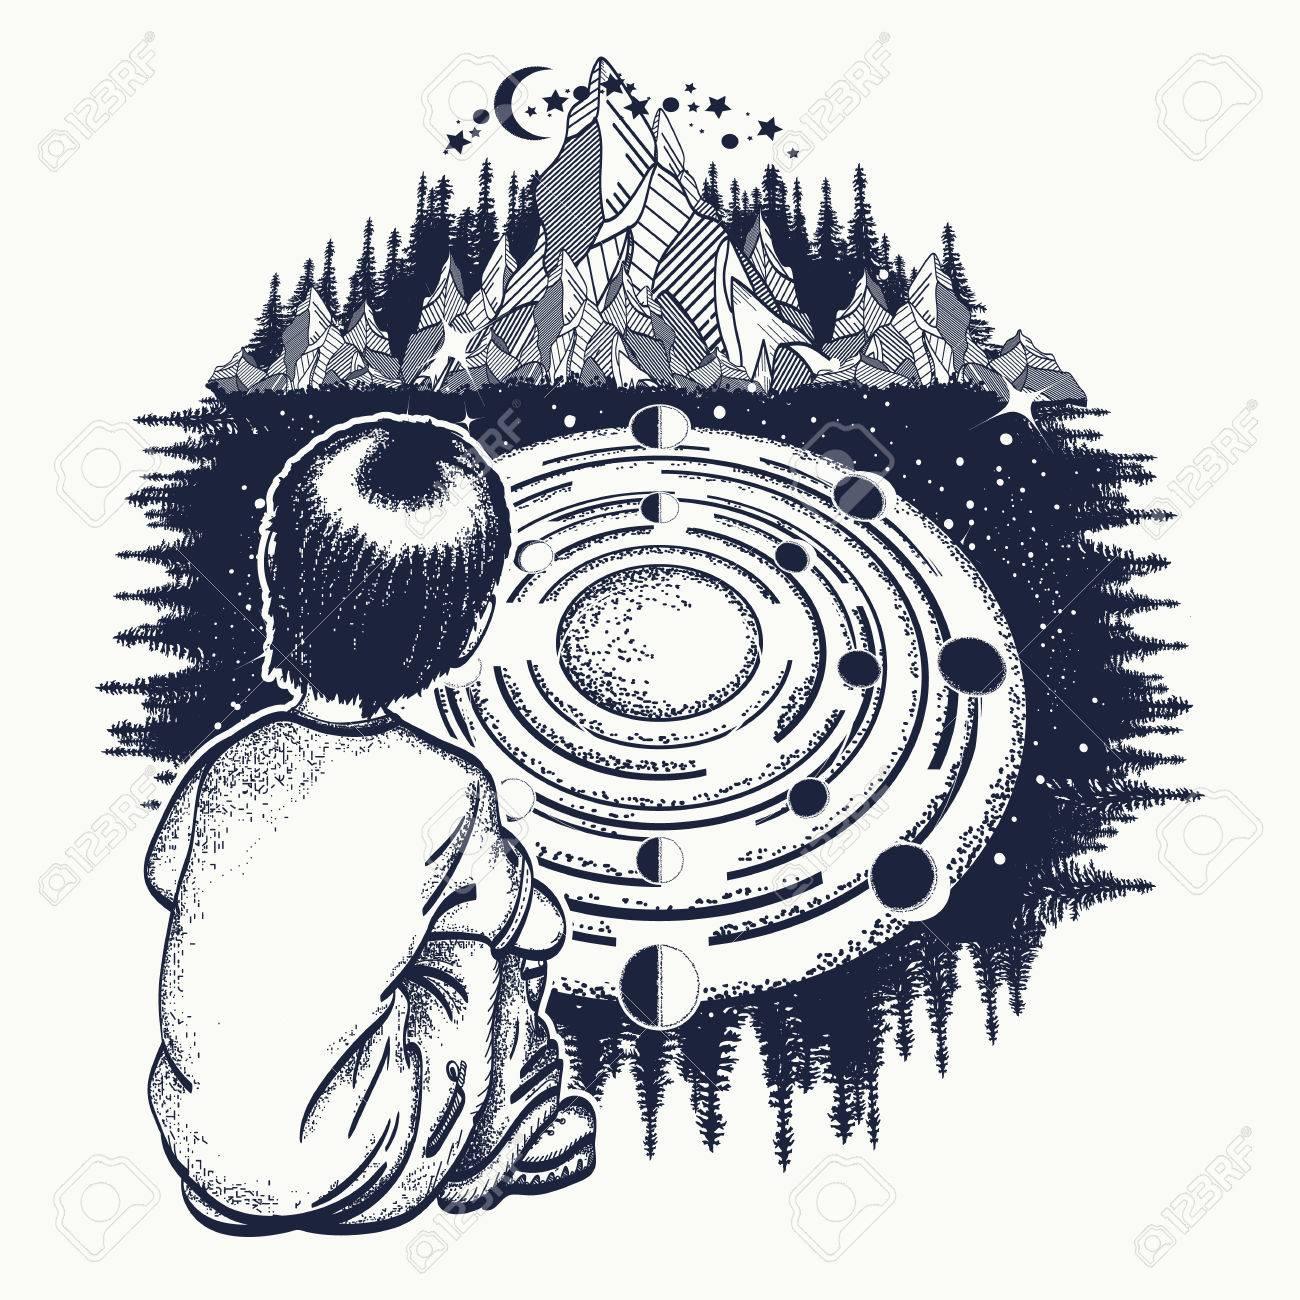 Dreamer tattoo art ingenious boy studies solar system symbol ingenious boy studies solar system symbol of the universe galaxy buycottarizona